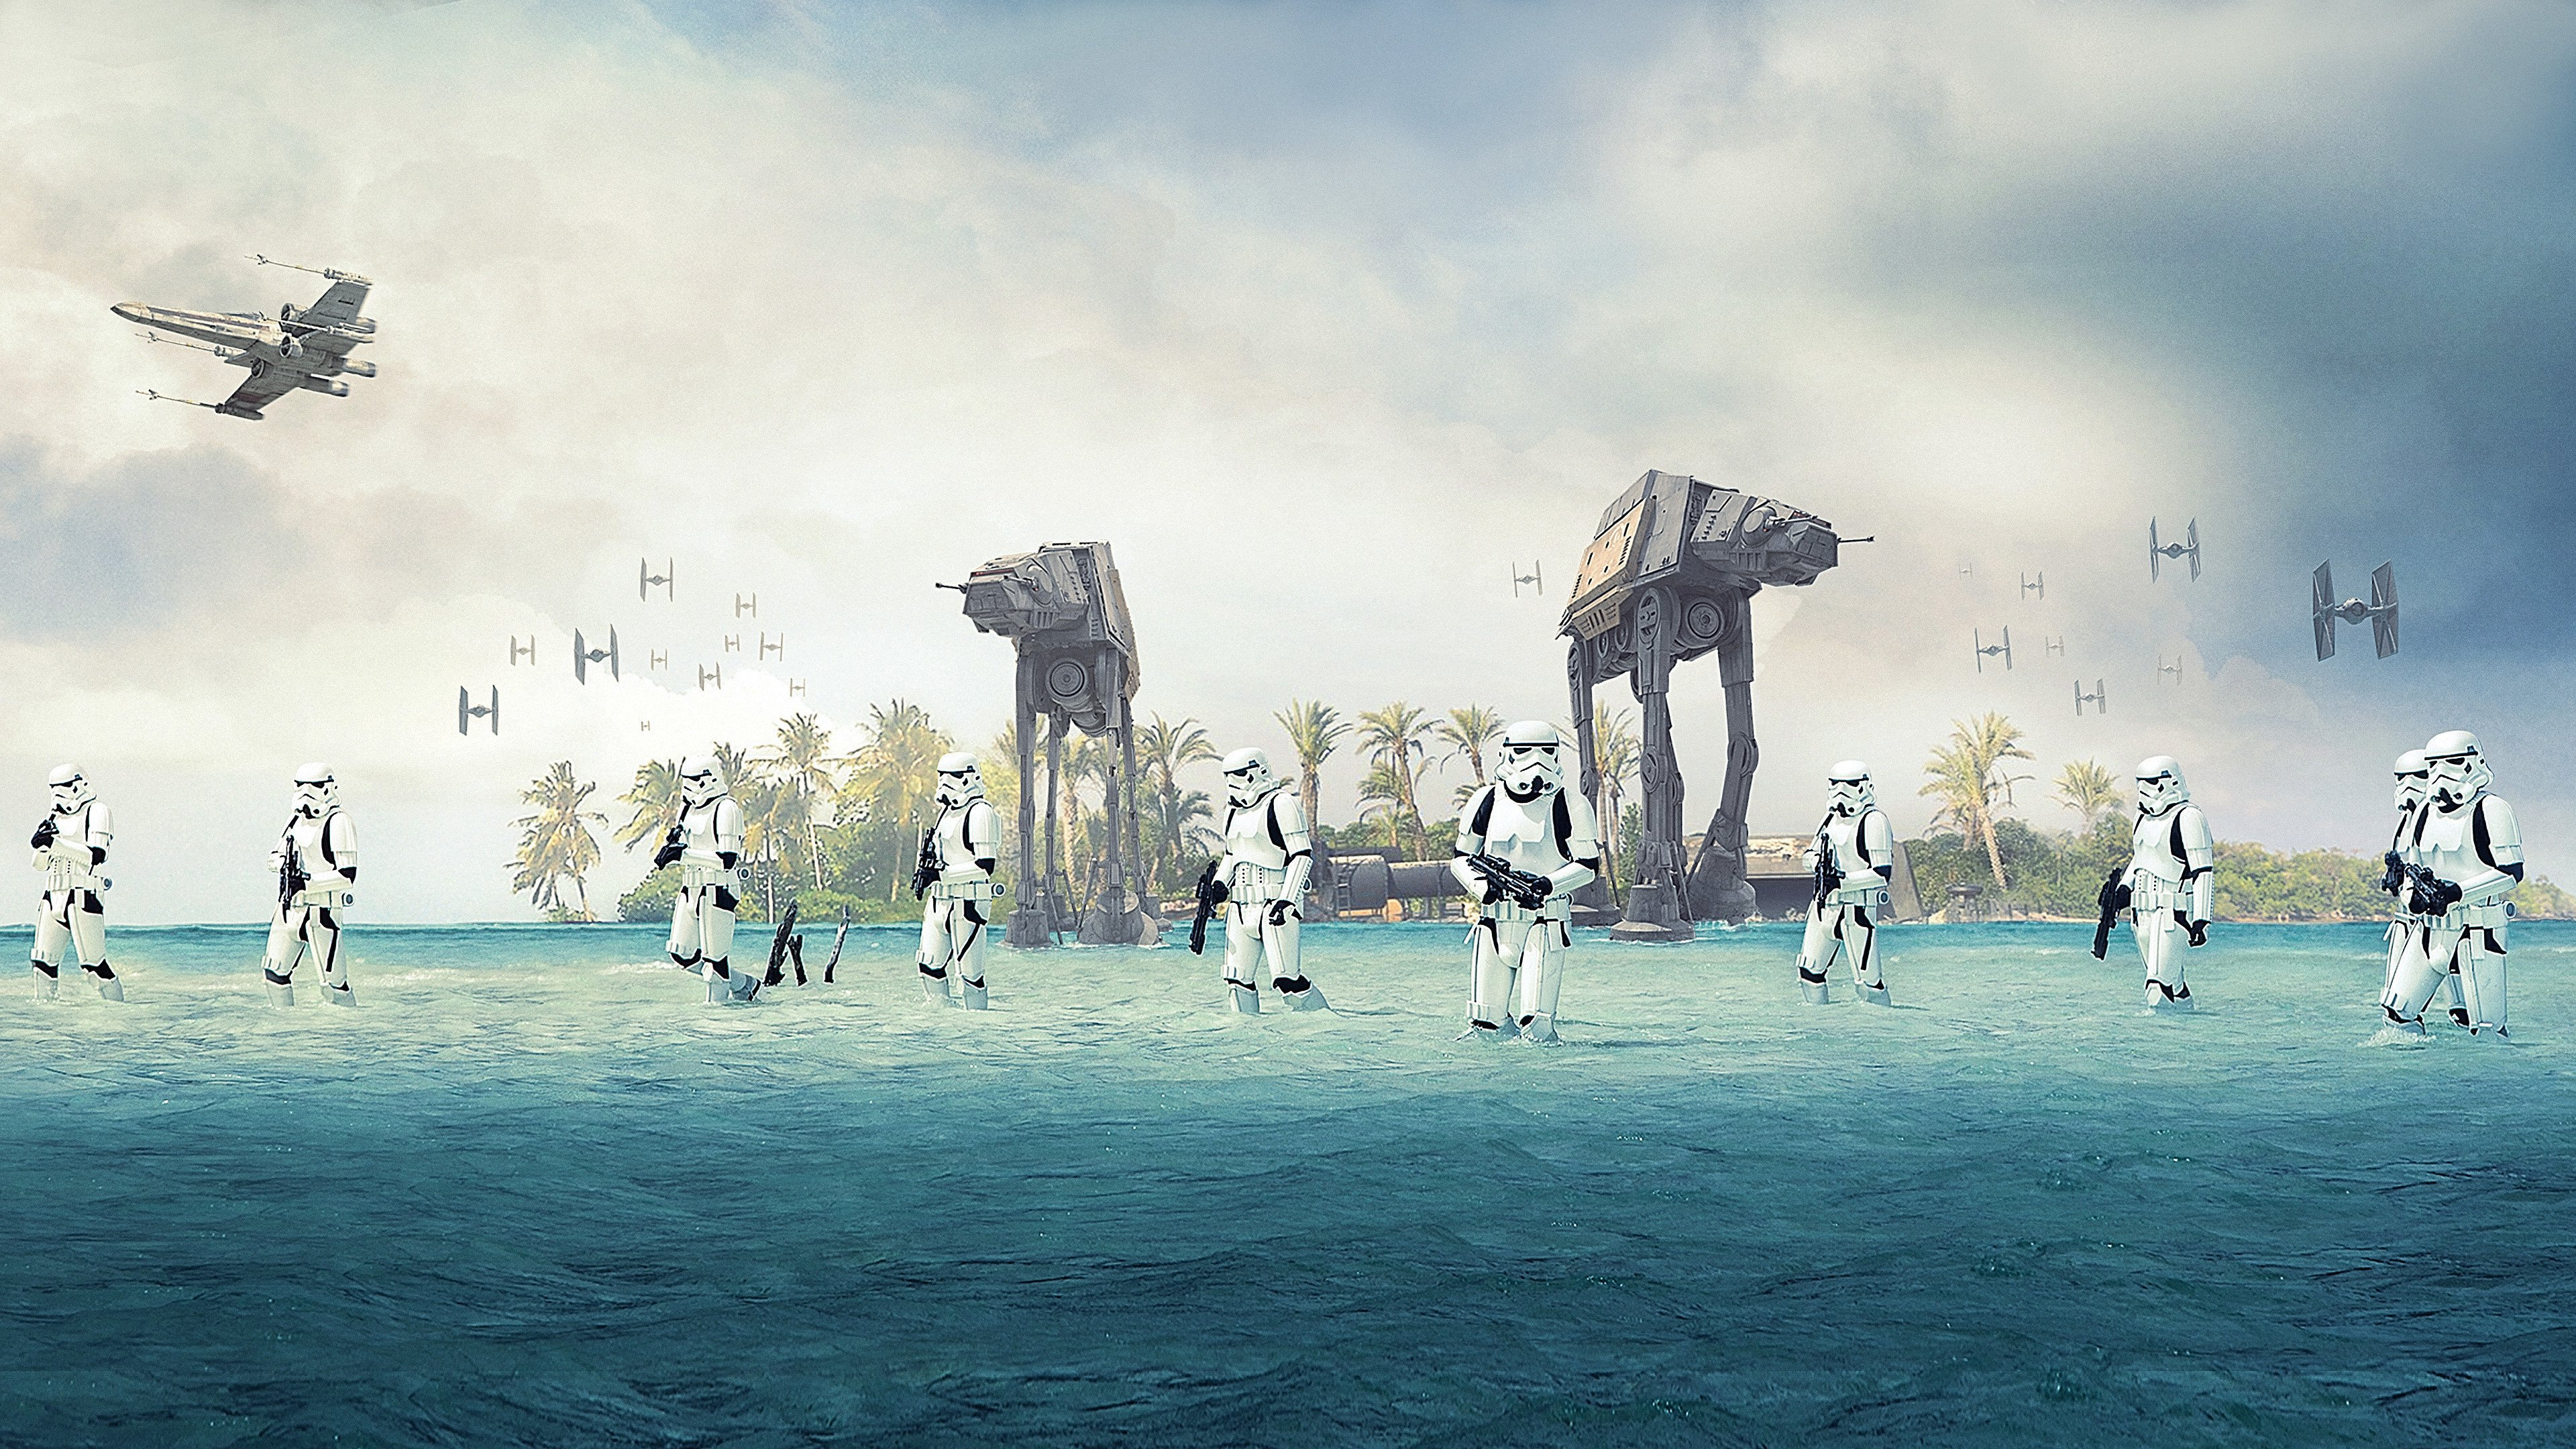 Rogue One A Star Wars Story 4k Ultra Hd Wallpaper Hintergrund